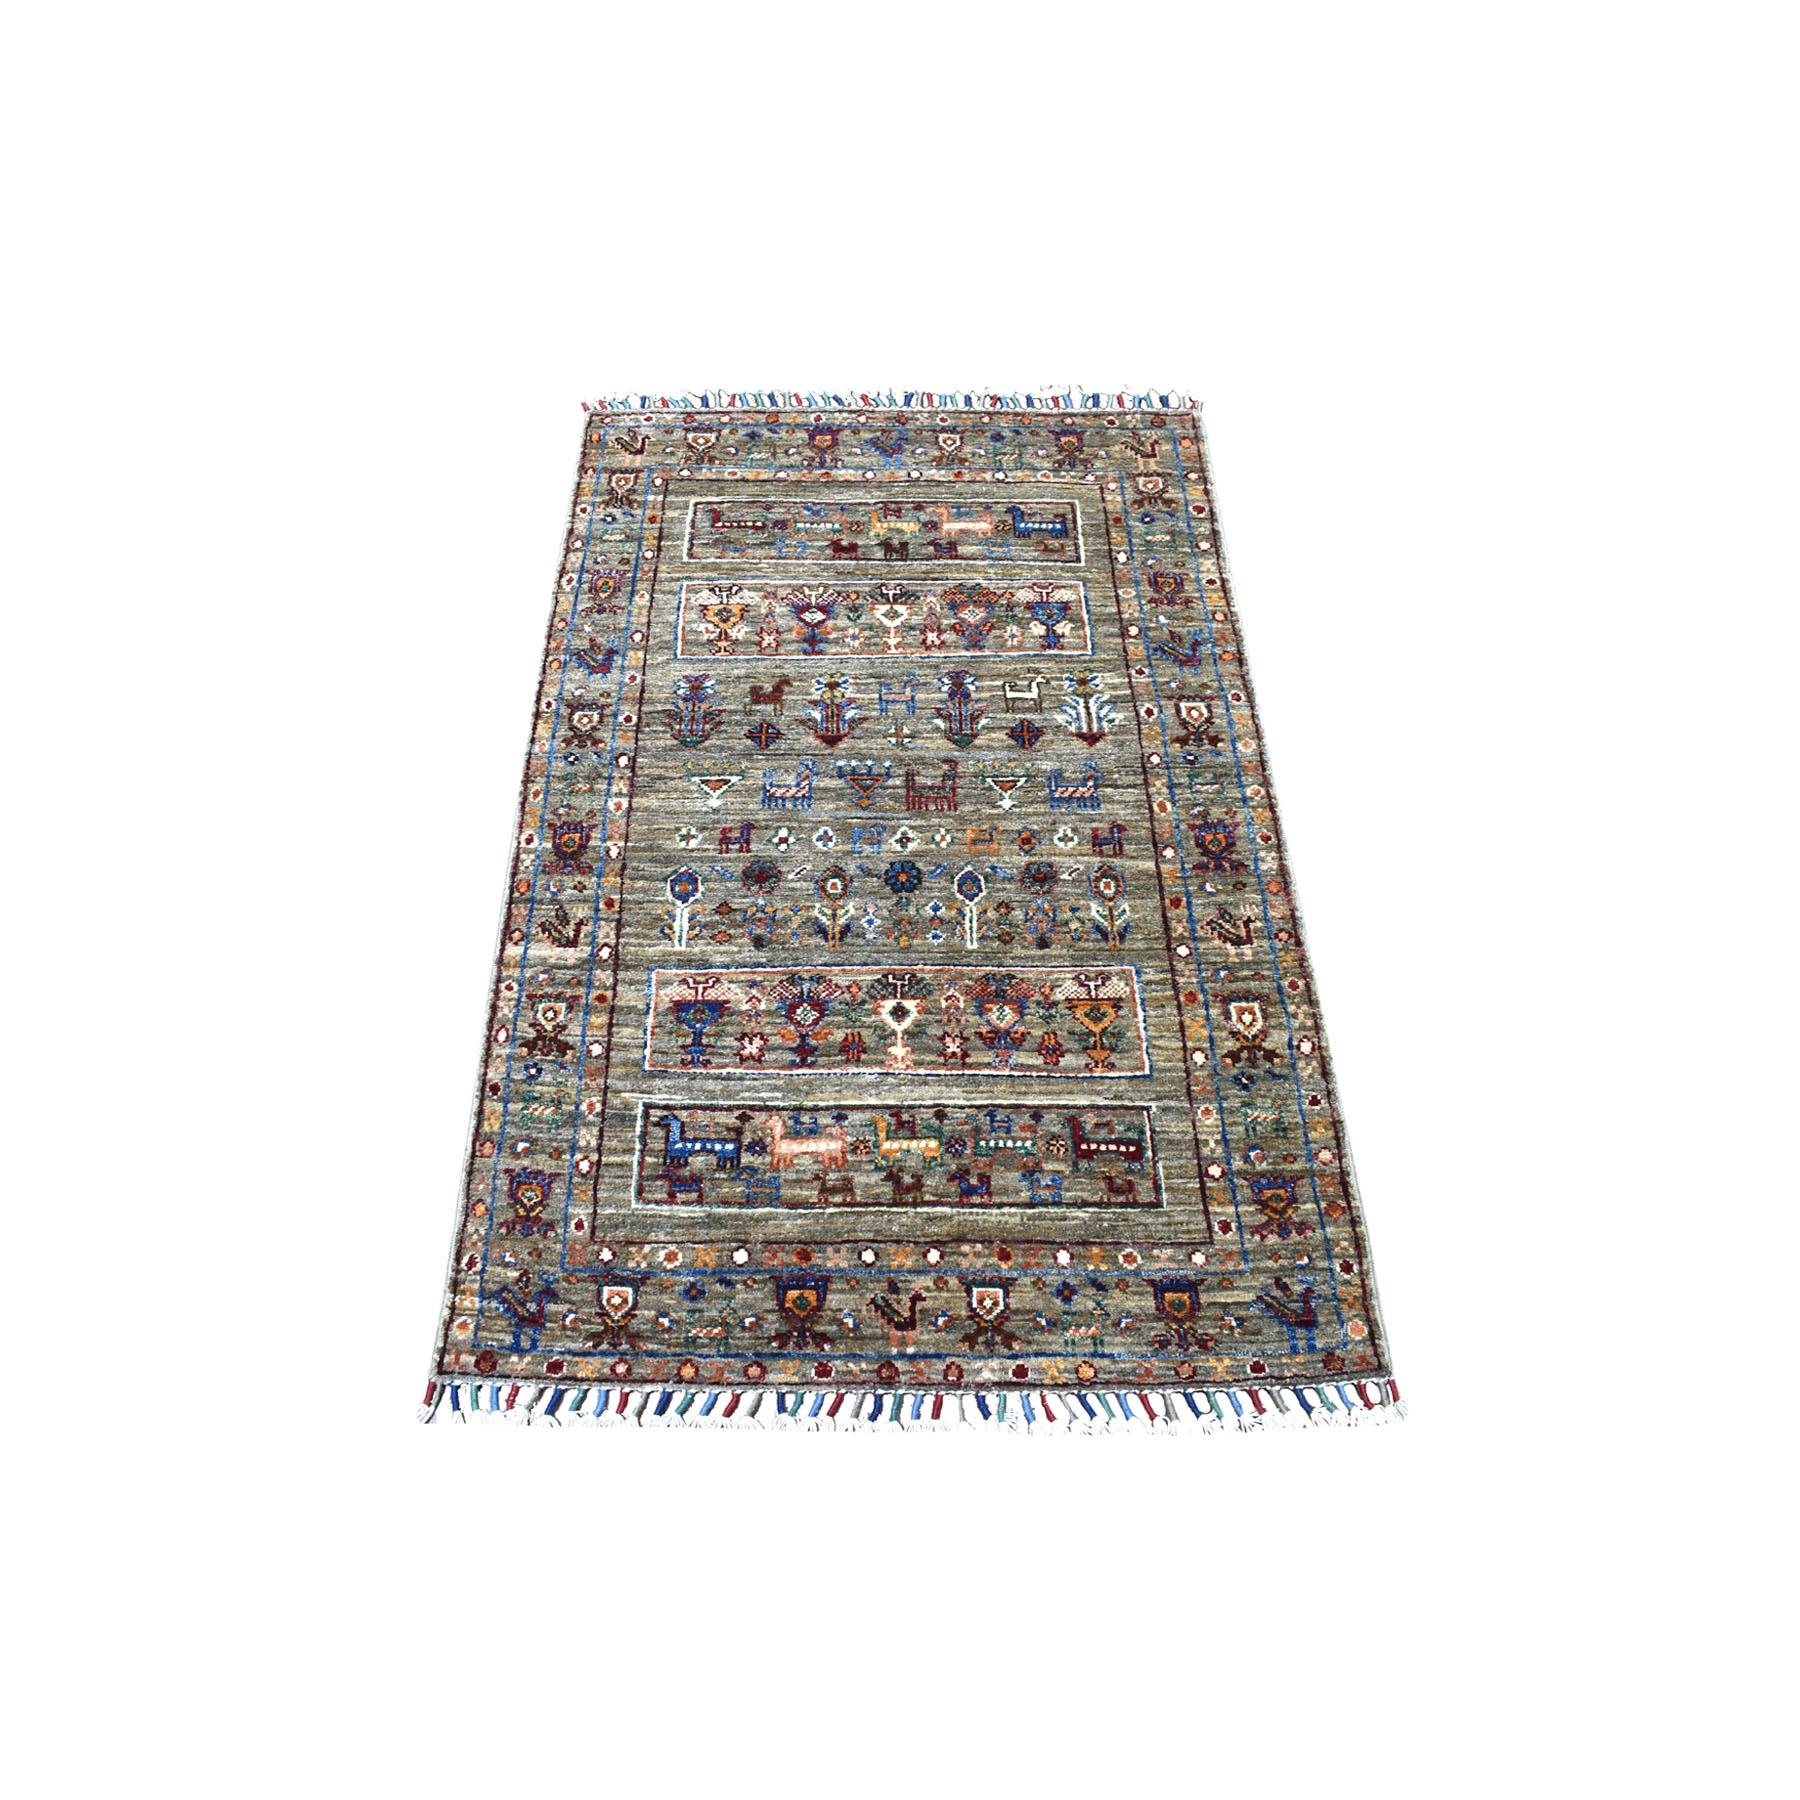 "2'7""x4' Gray Super Kazak Khorjin Design With Colorful Tassles Hand Knotted Natural Wool Ethnic Oriental Rug"